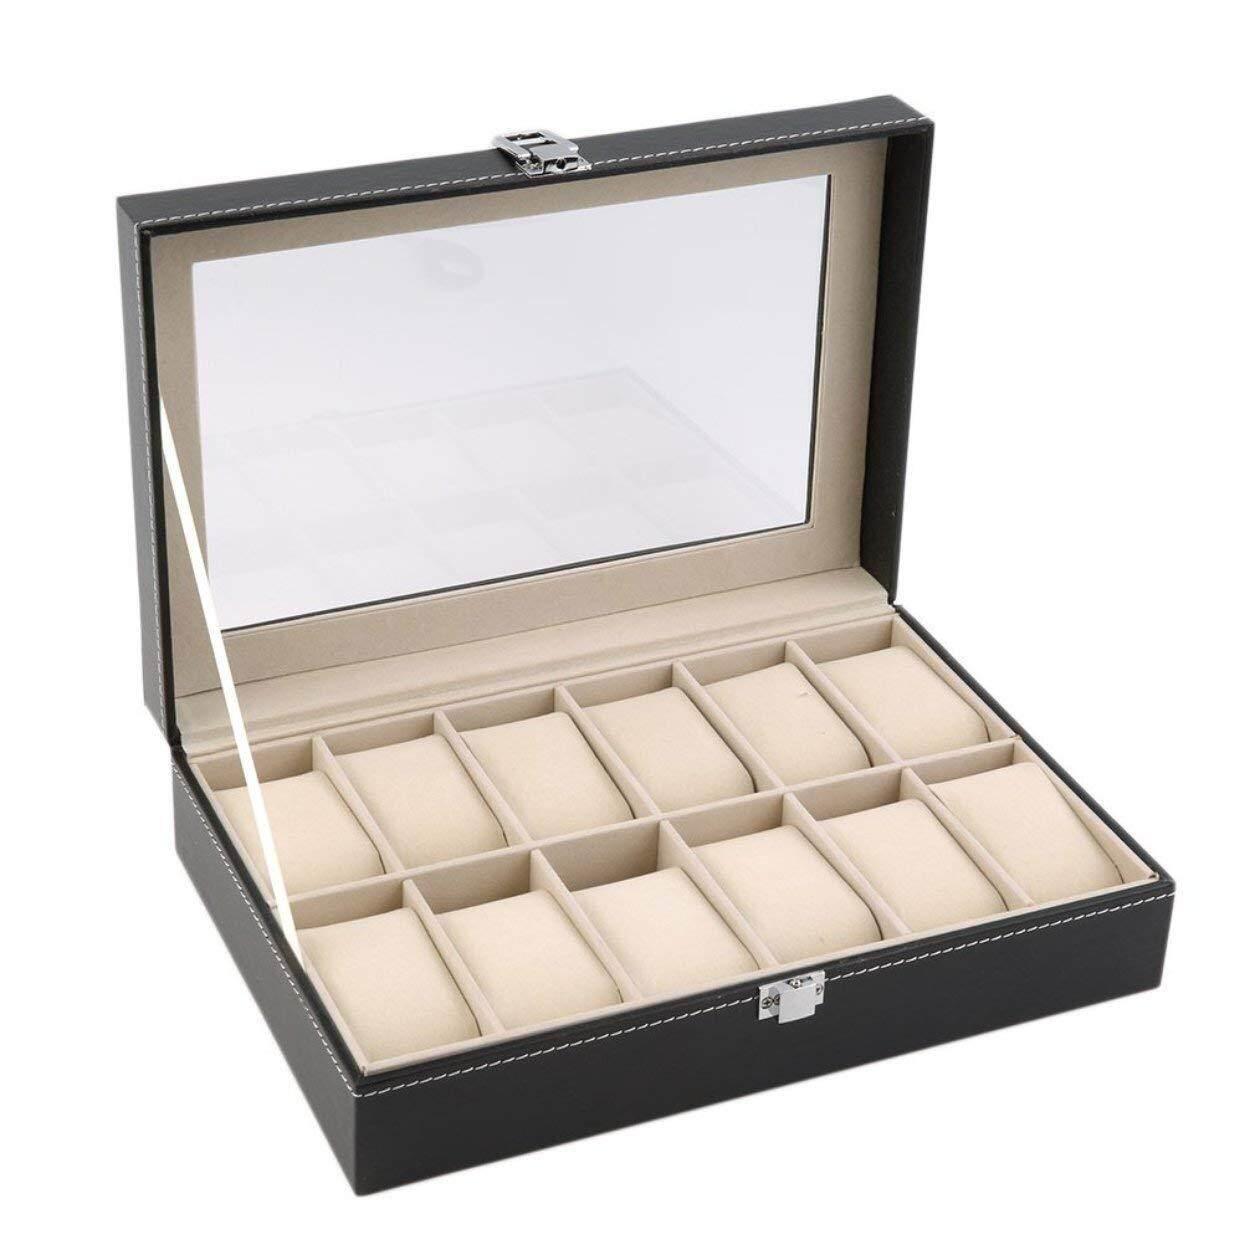 [Ready Stock] Premium PU Leather Watch Display Storage BoxCase - 12 Slots Malaysia